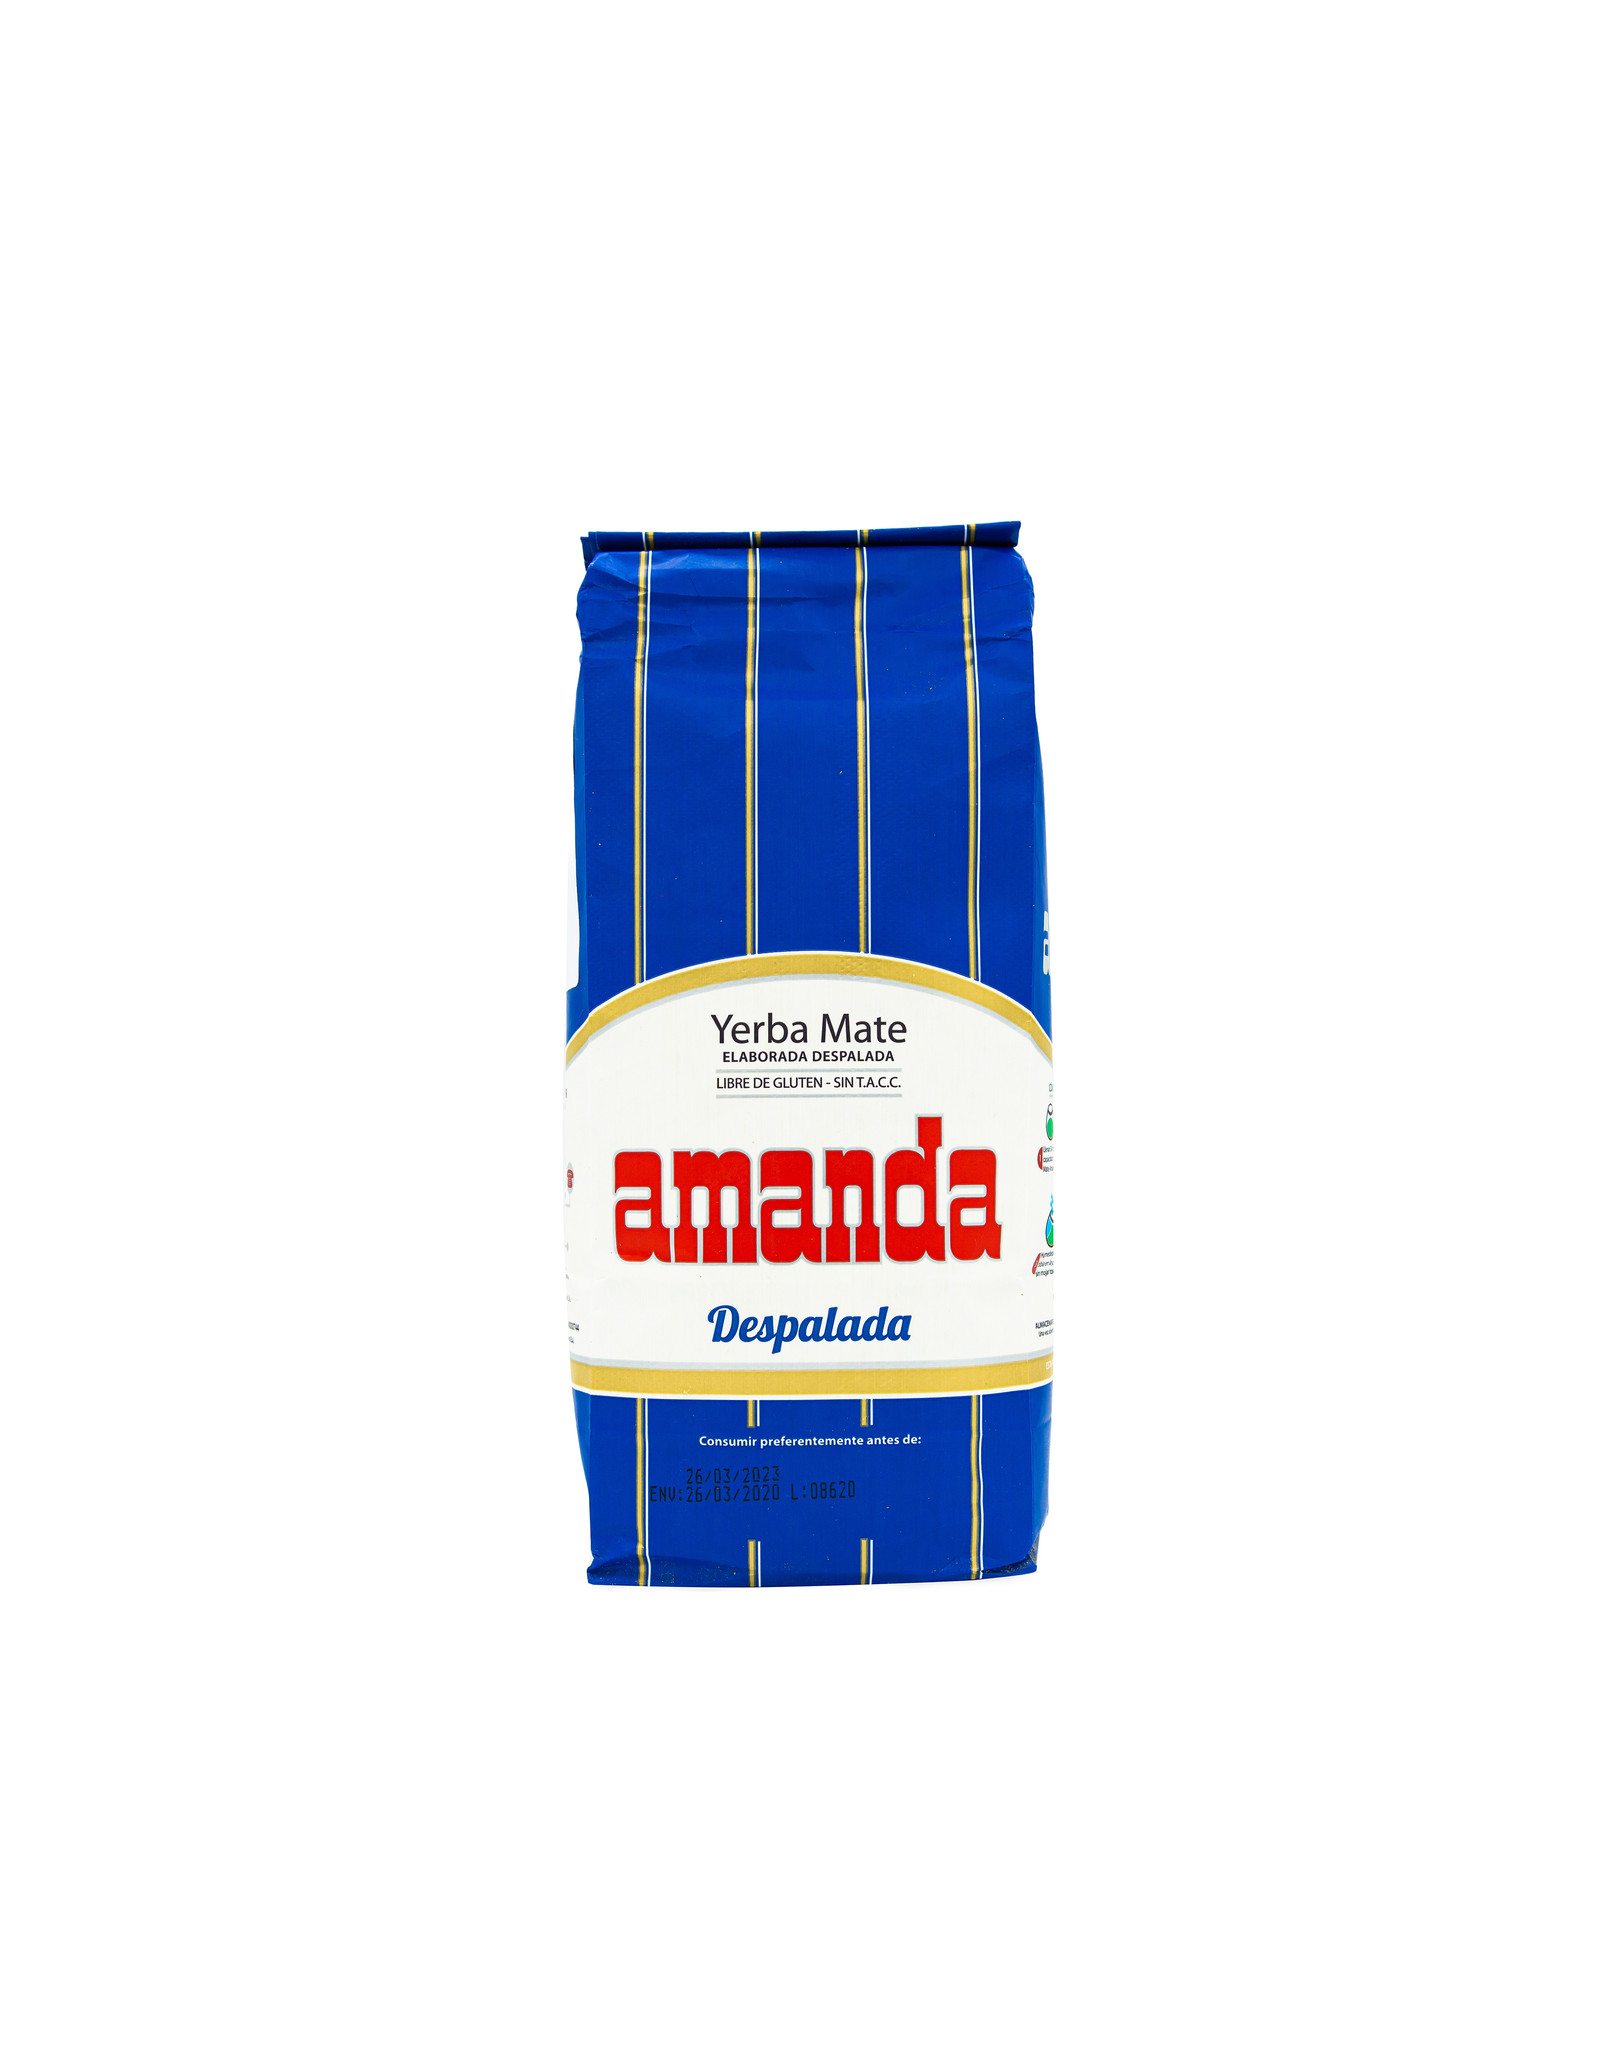 Amanda Amanda despalada sin palo